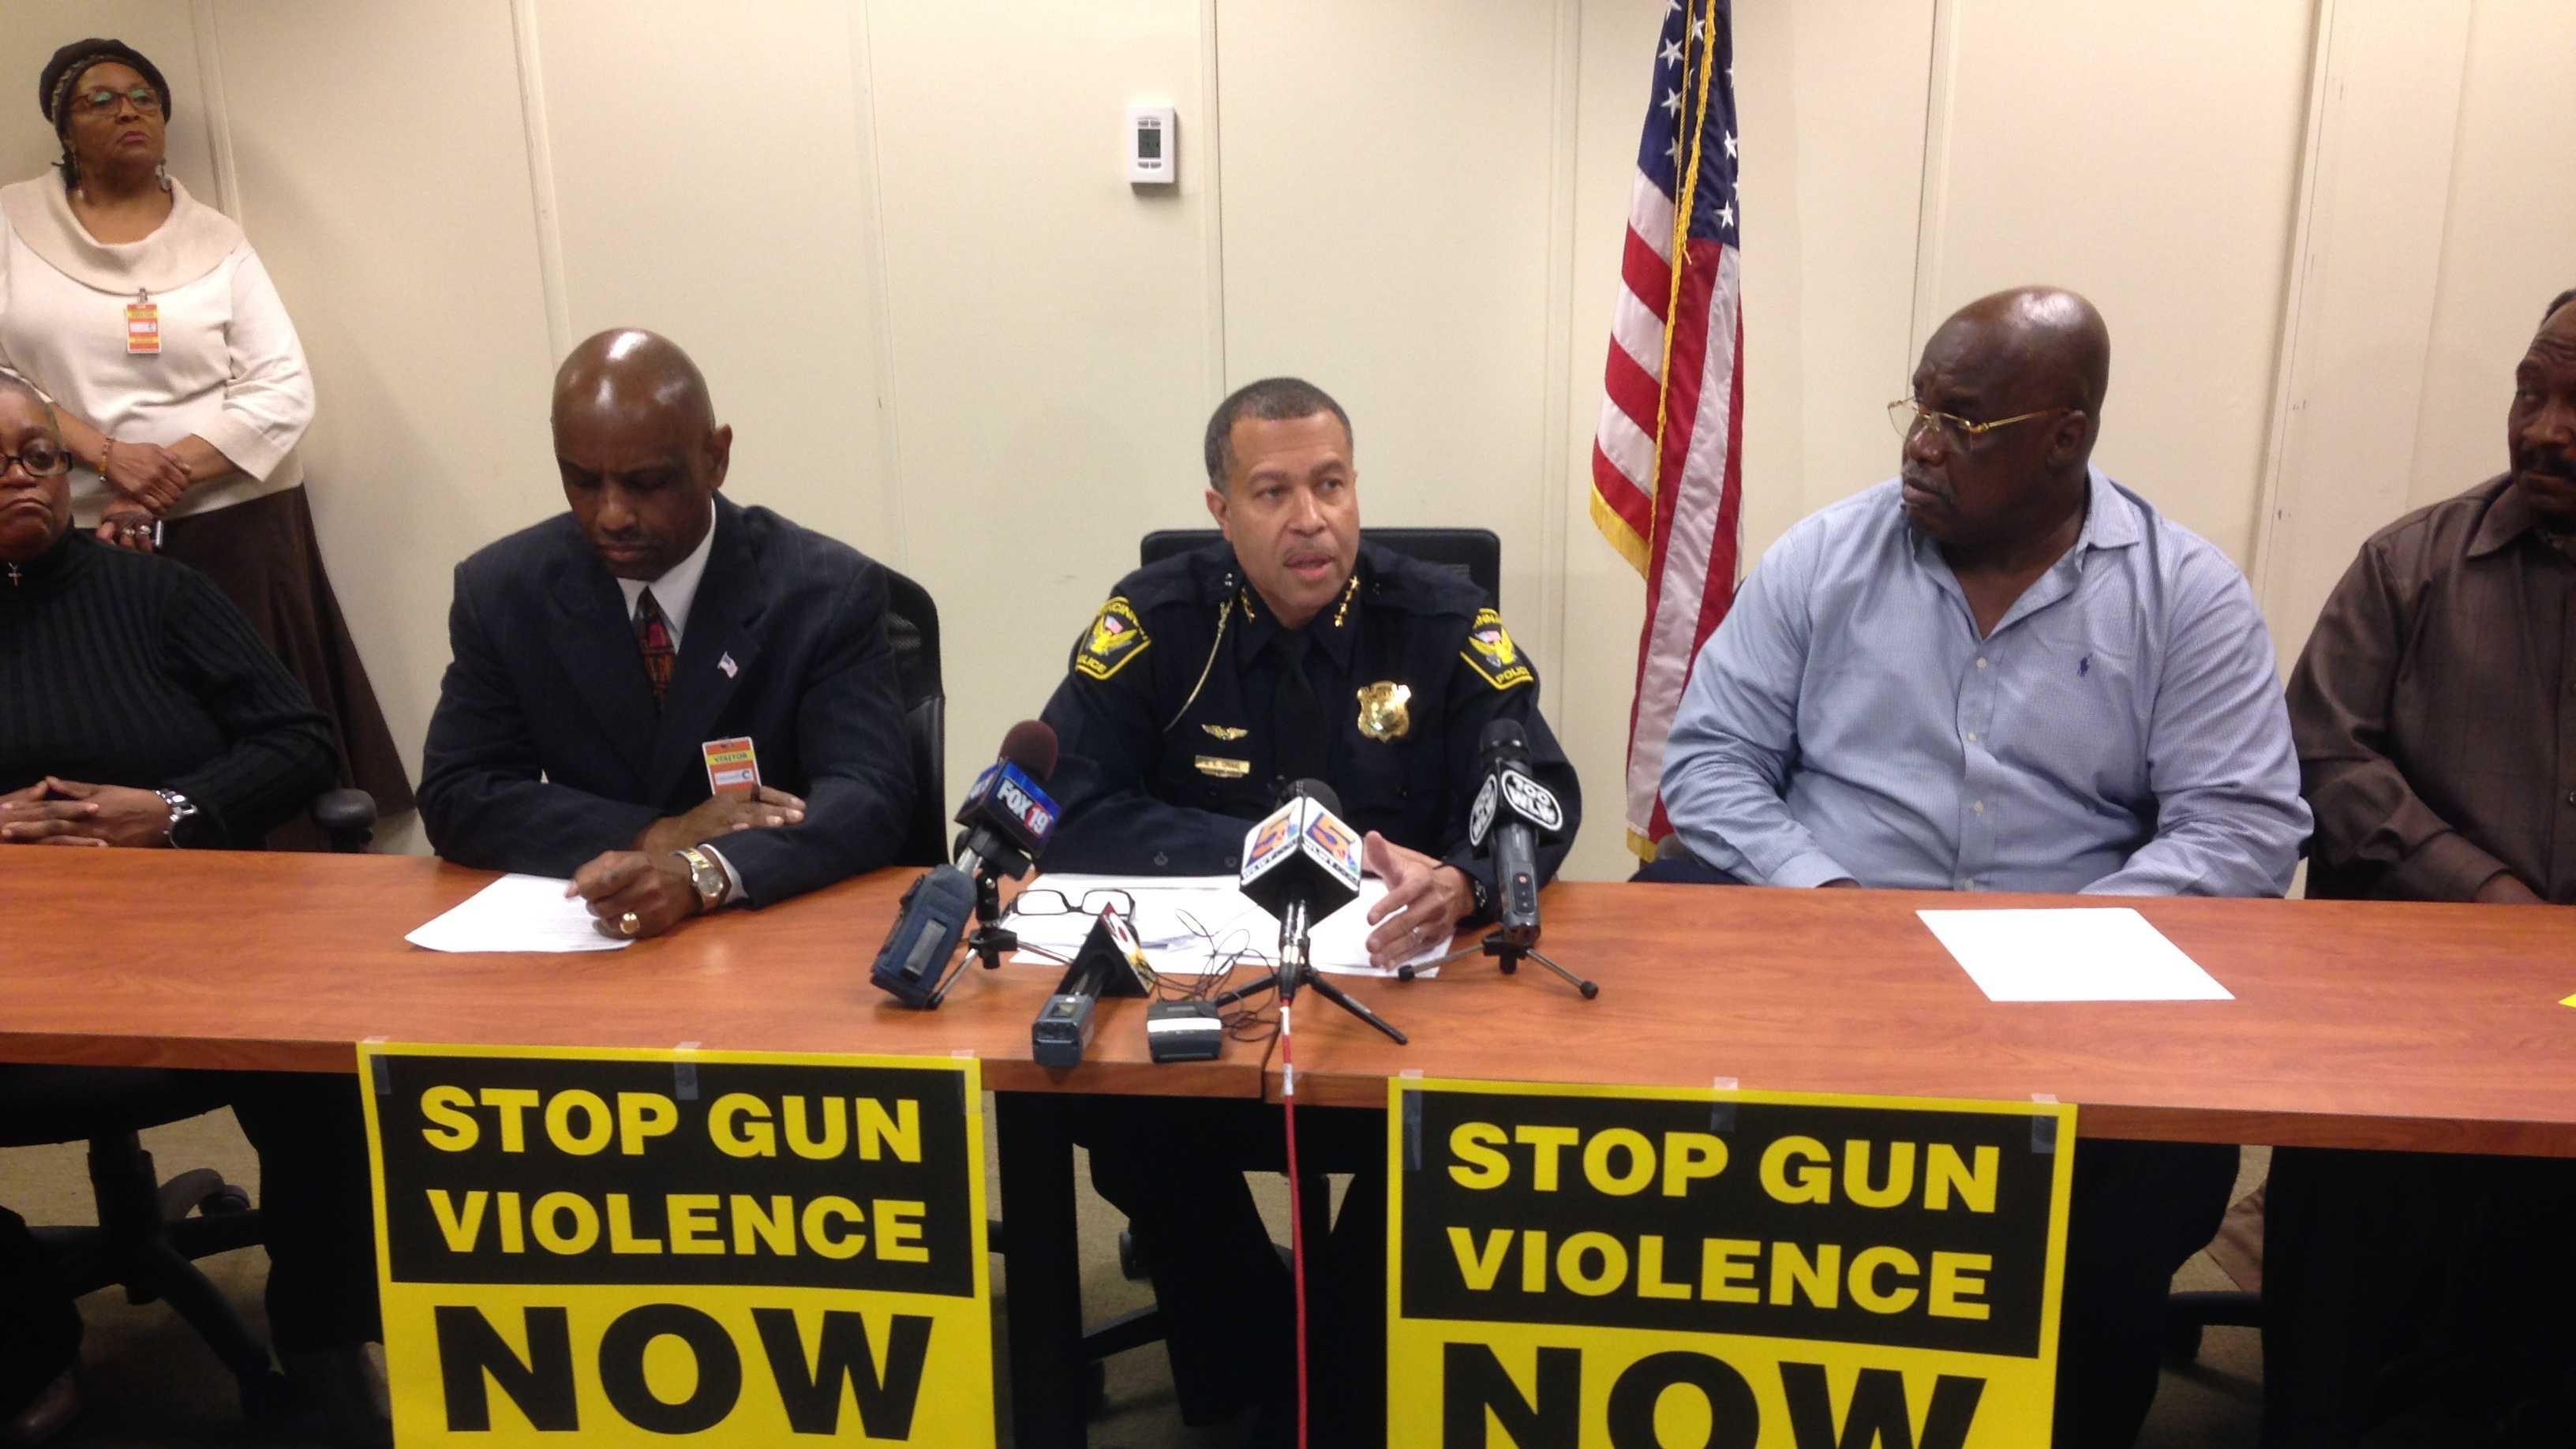 Chief James Craig gun violence.jpg